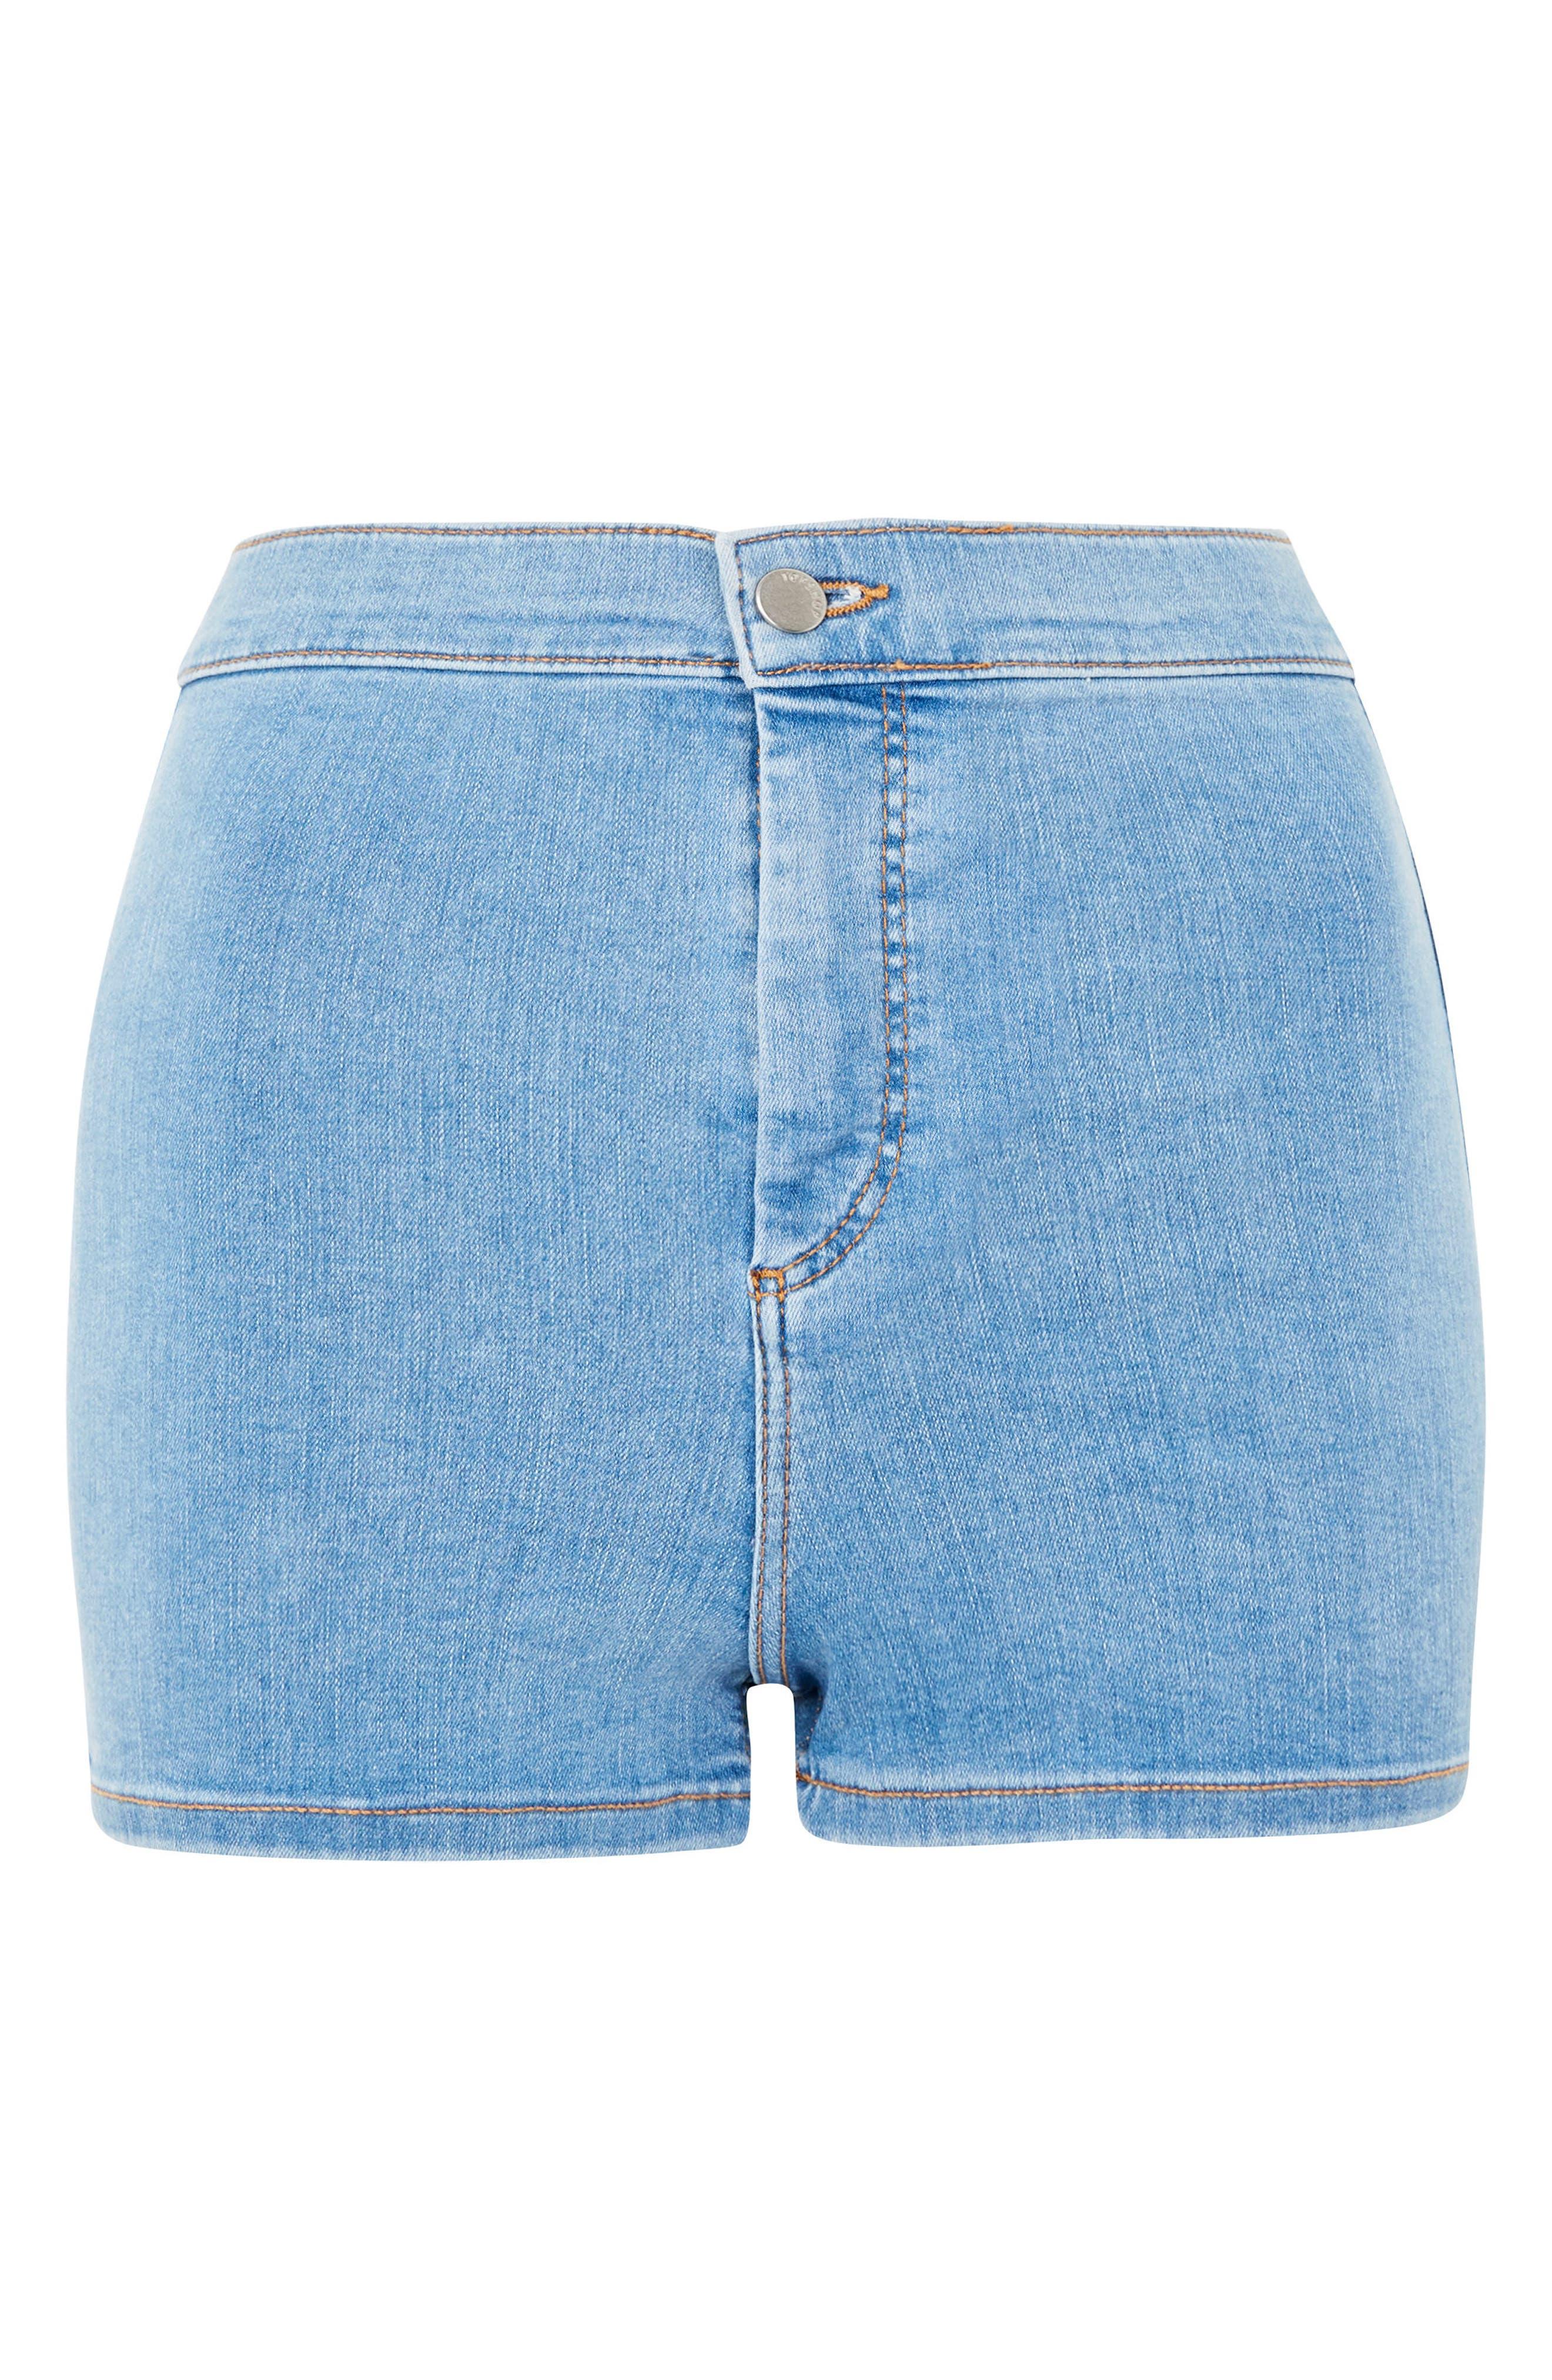 Joni Light Denim High Waist Shorts,                             Alternate thumbnail 4, color,                             Light Denim